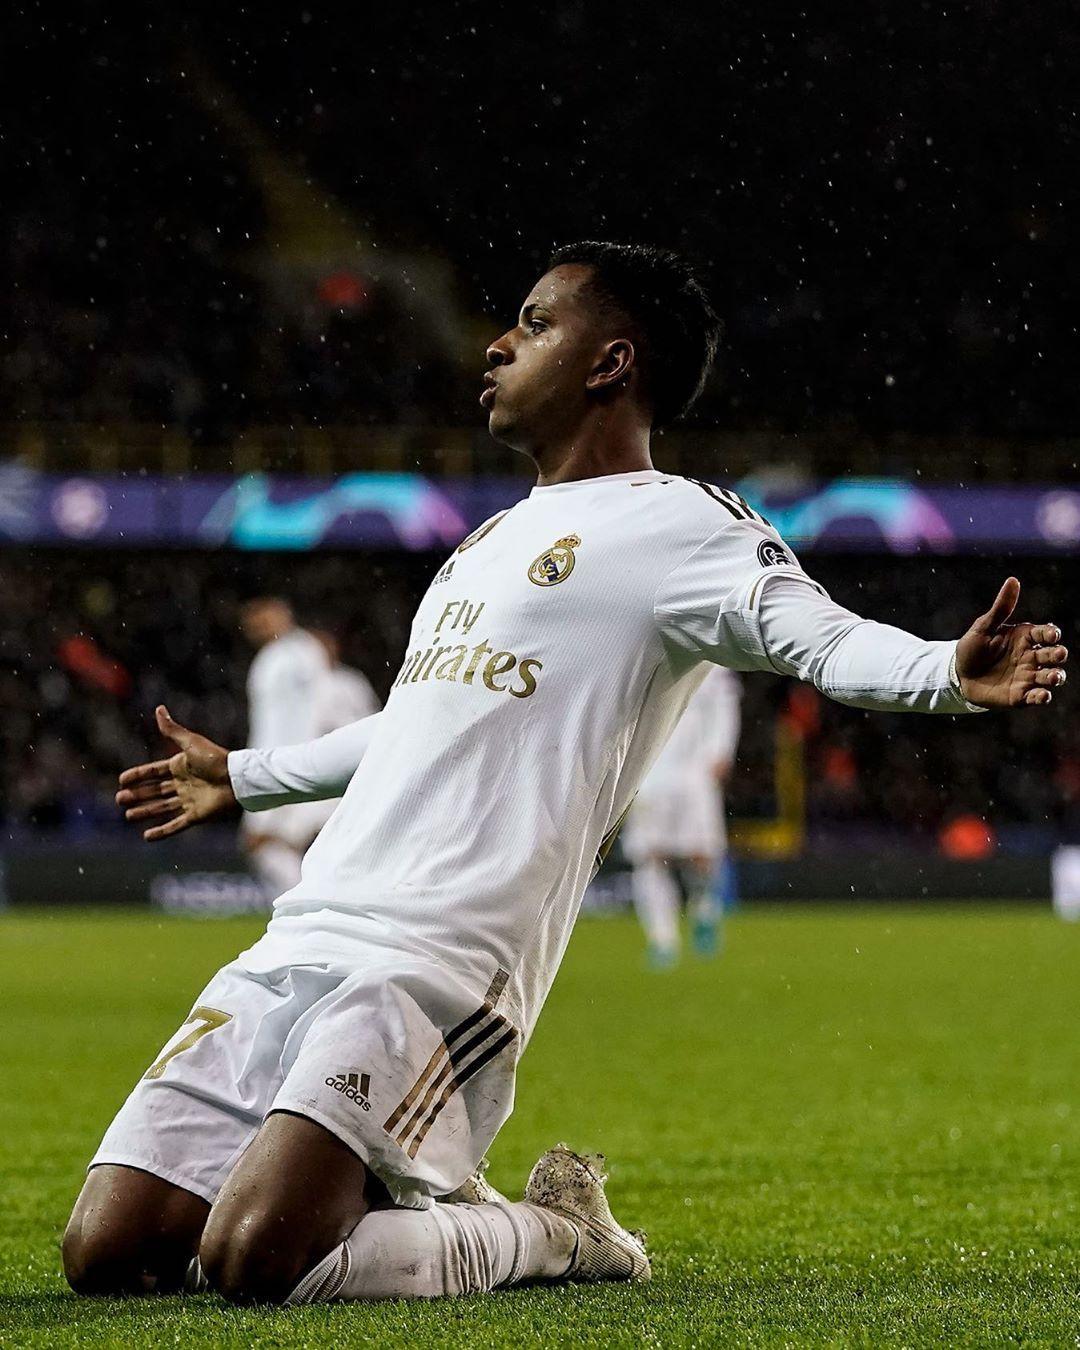 350 9 Mil Me Gusta 741 Comentarios Real Madrid C F Realmadrid En Instagram Rodrygogoes In The Champio Real Madrid Real Madrid Club Real Madrid 11